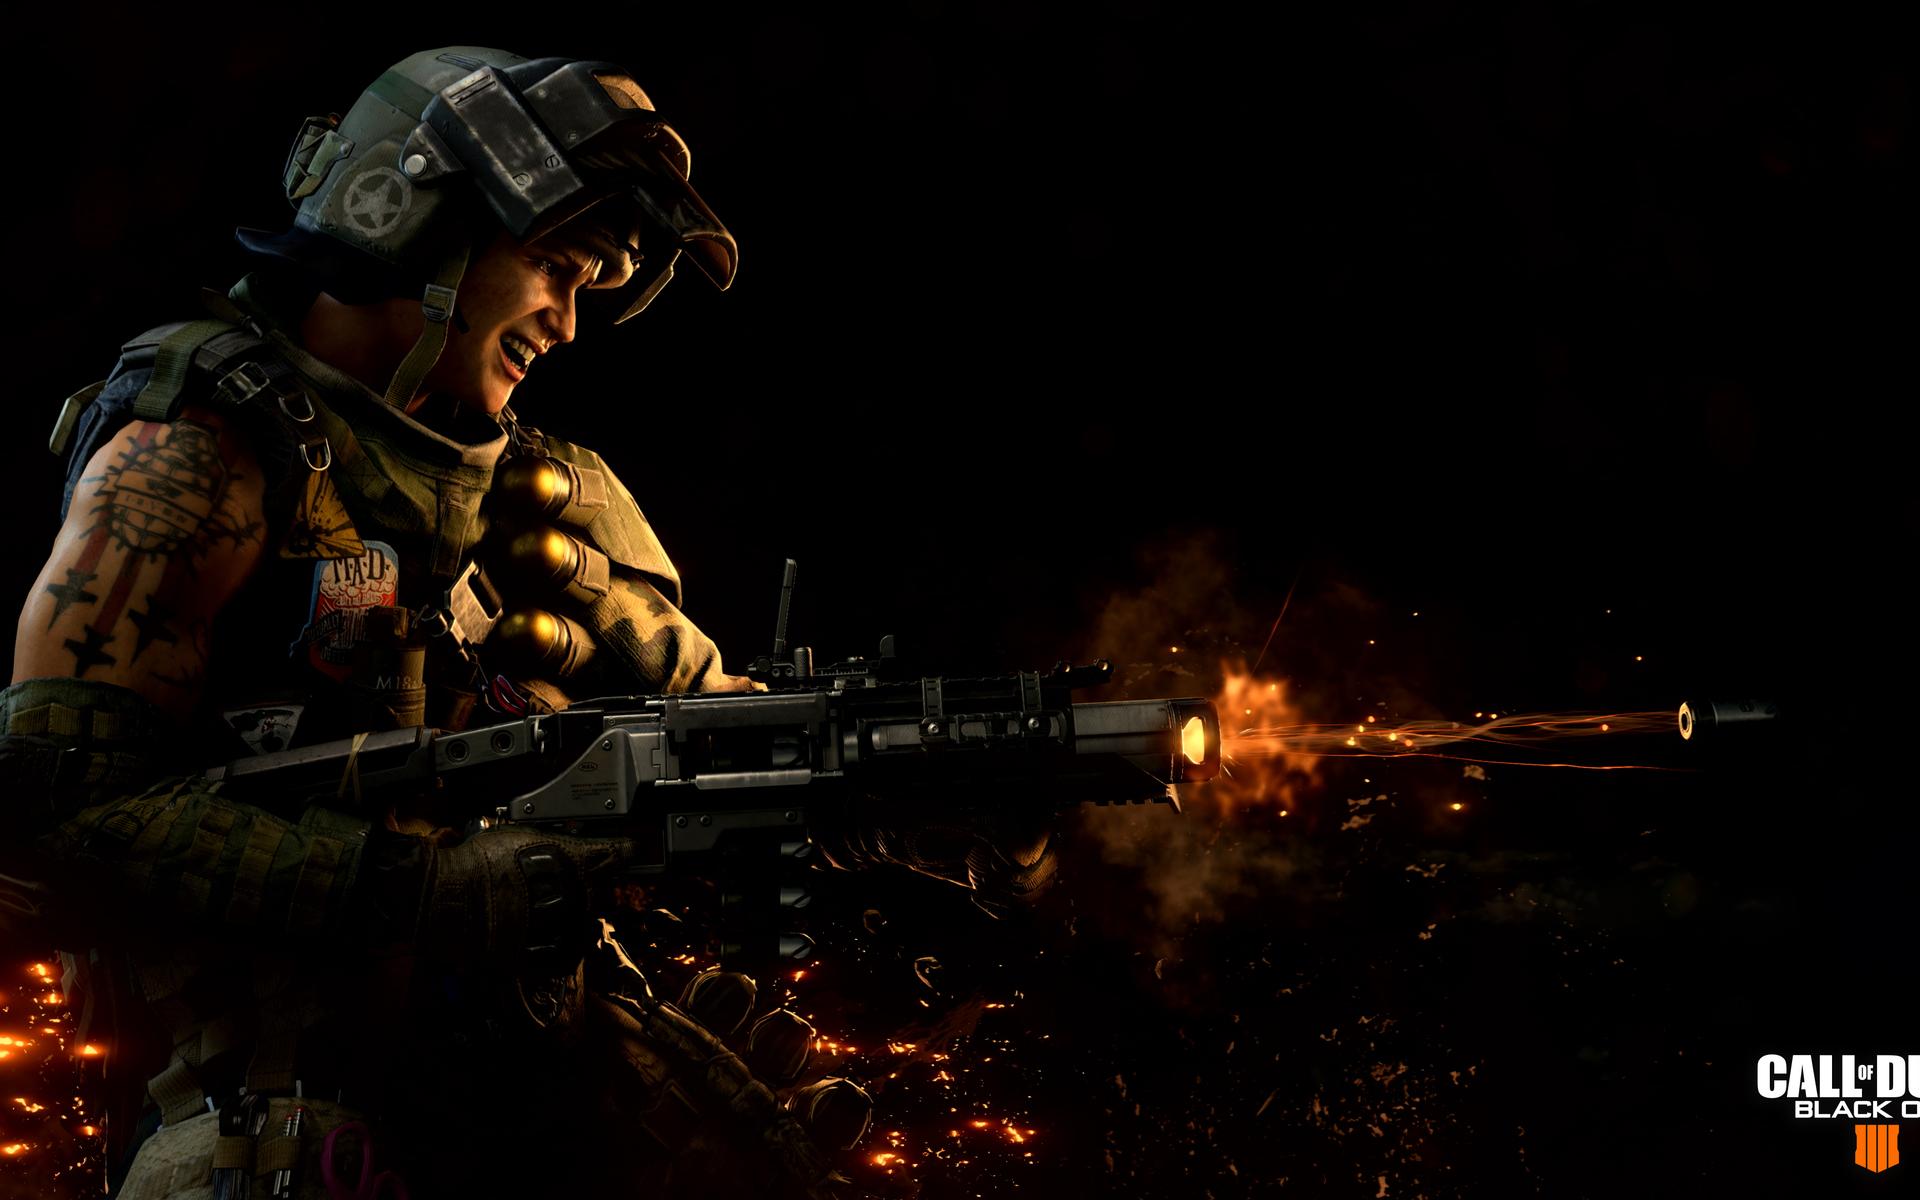 call-of-duty-black-ops-4-4k-g5.jpg